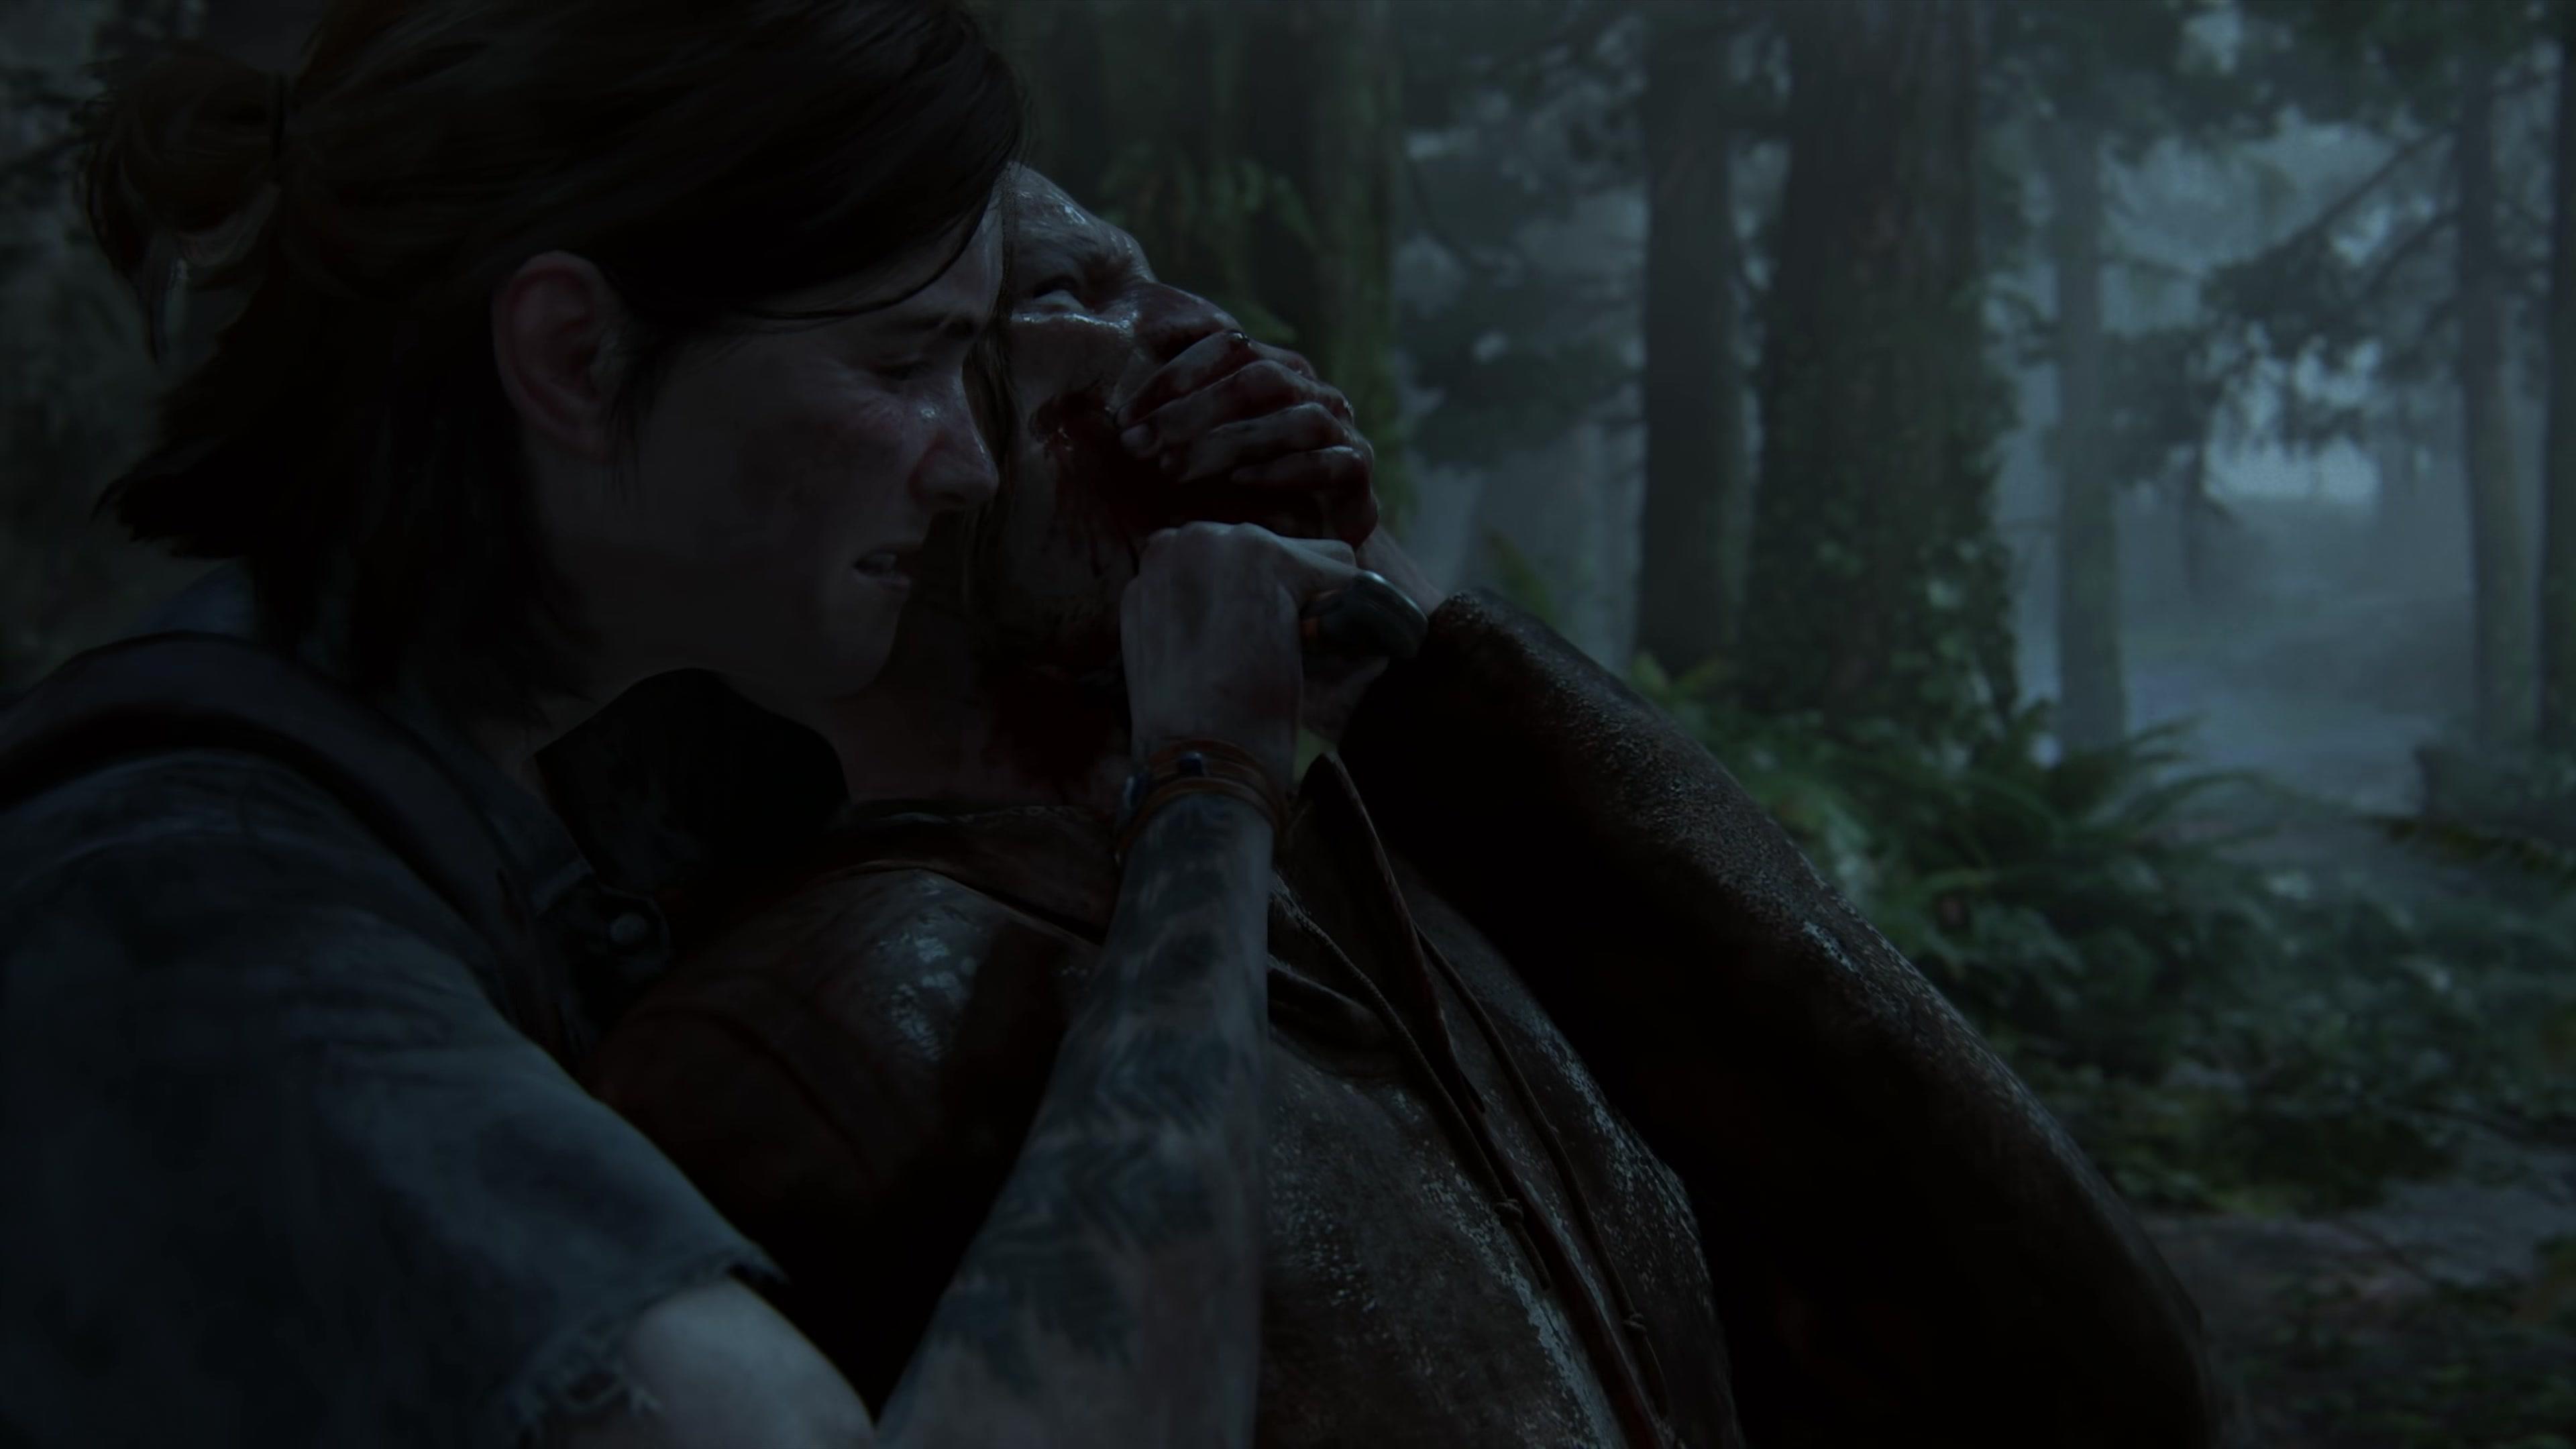 The last of us 2 223.jpg - Last of Us: Part 2, the